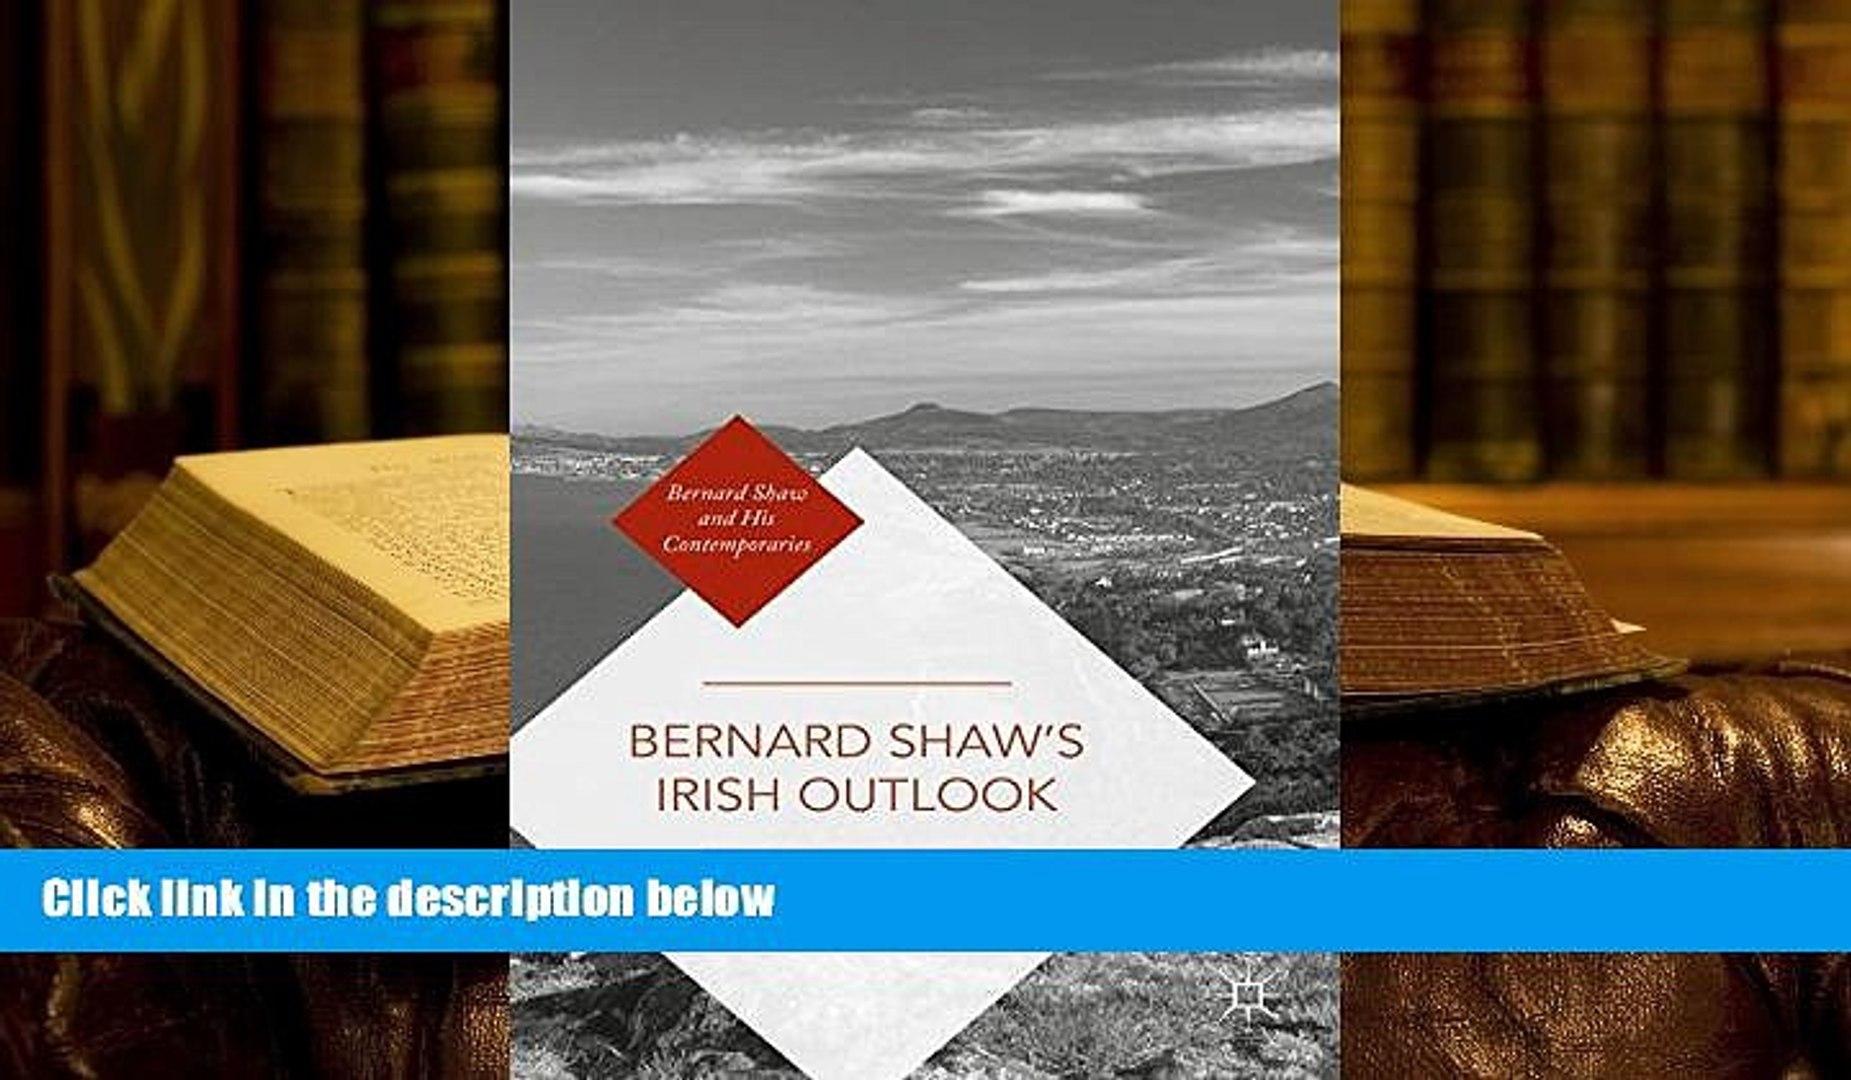 Epub  Bernard Shaw s Irish Outlook (Bernard Shaw and His Contemporaries) For Ipad